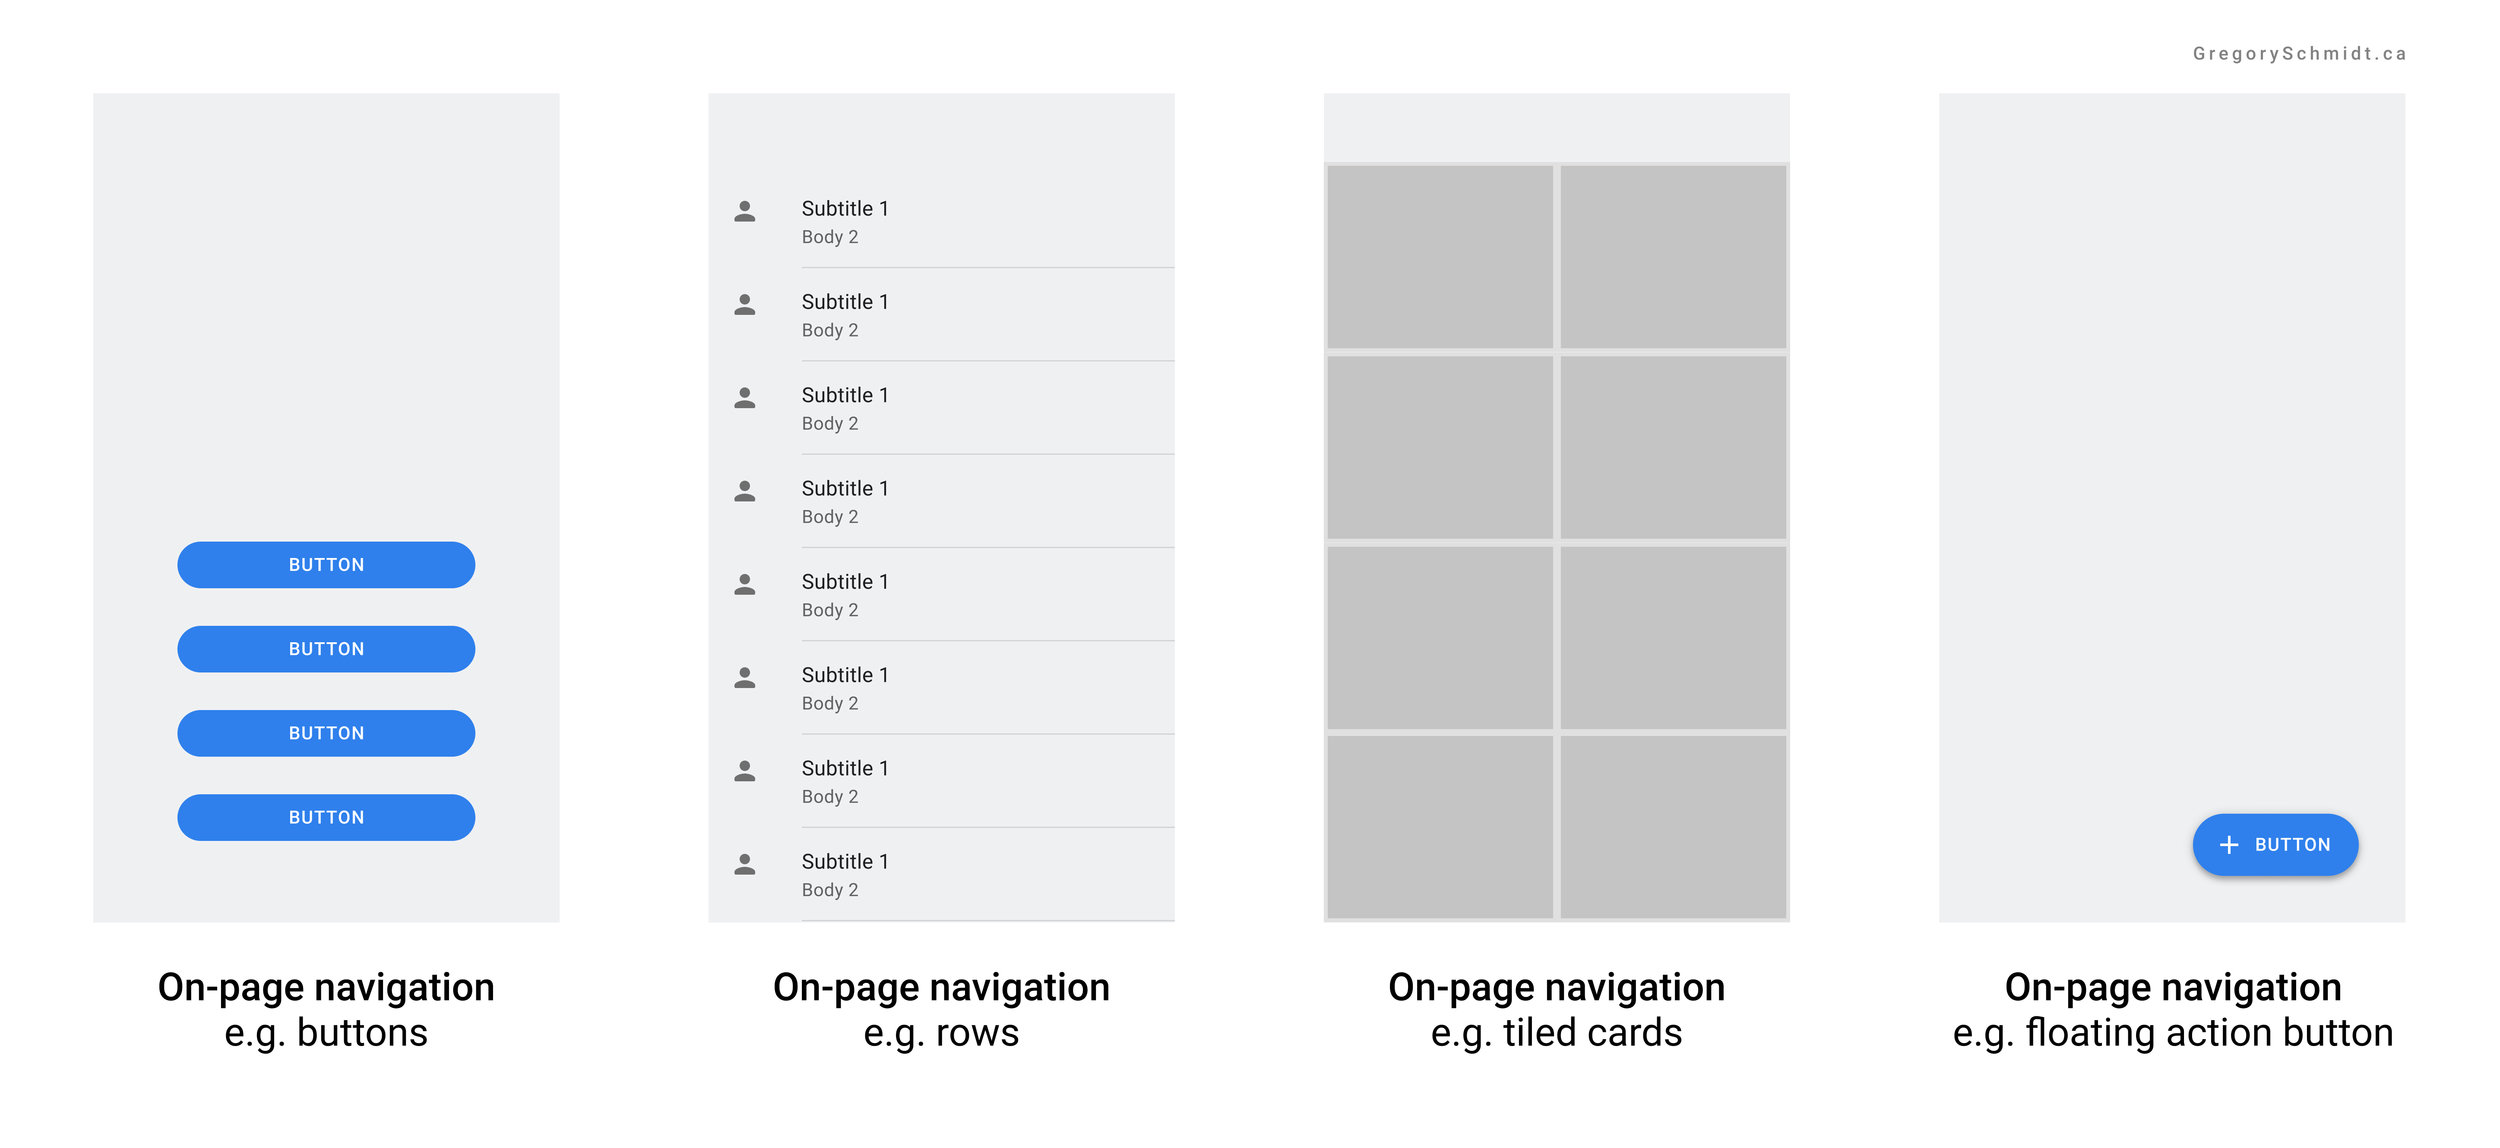 on-page navigation